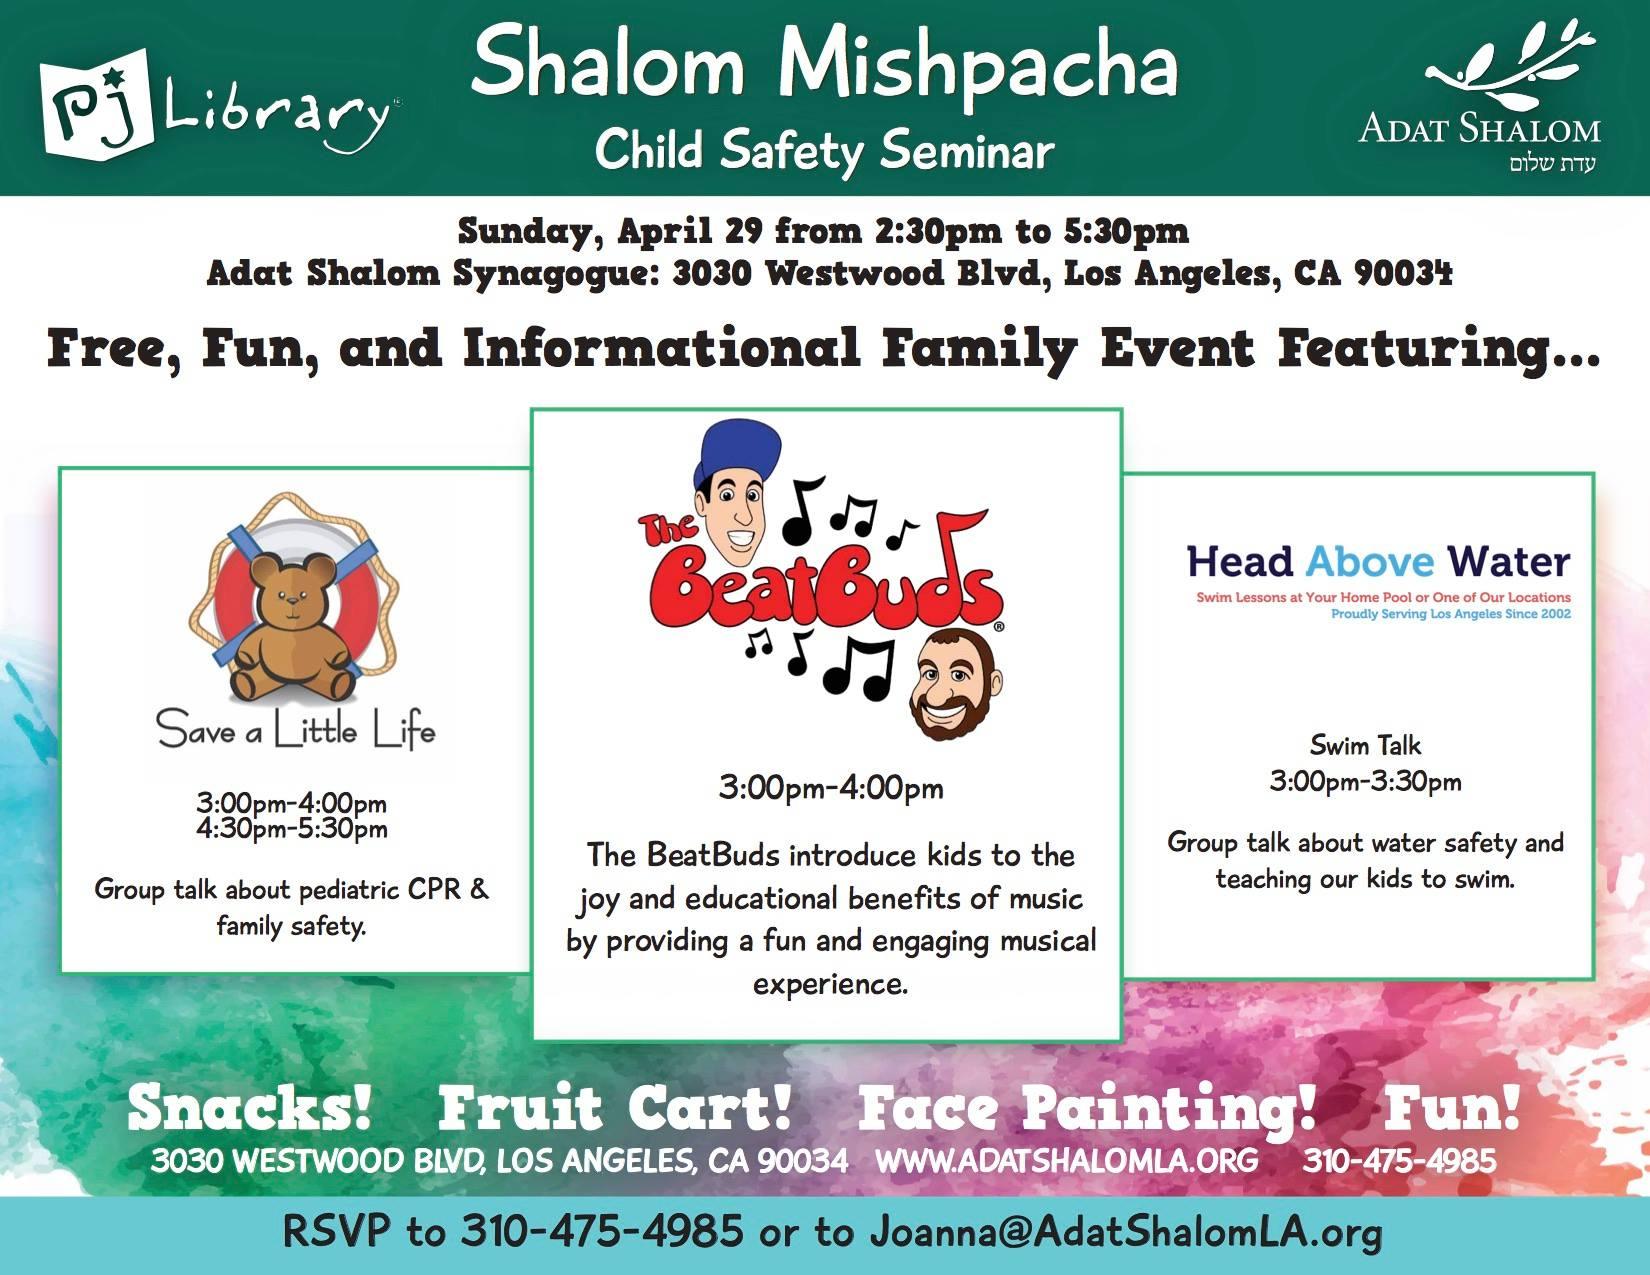 Shalom Misphacha Child Safety Seminar @ Adat Shalom Synagogue | Los Angeles | California | United States